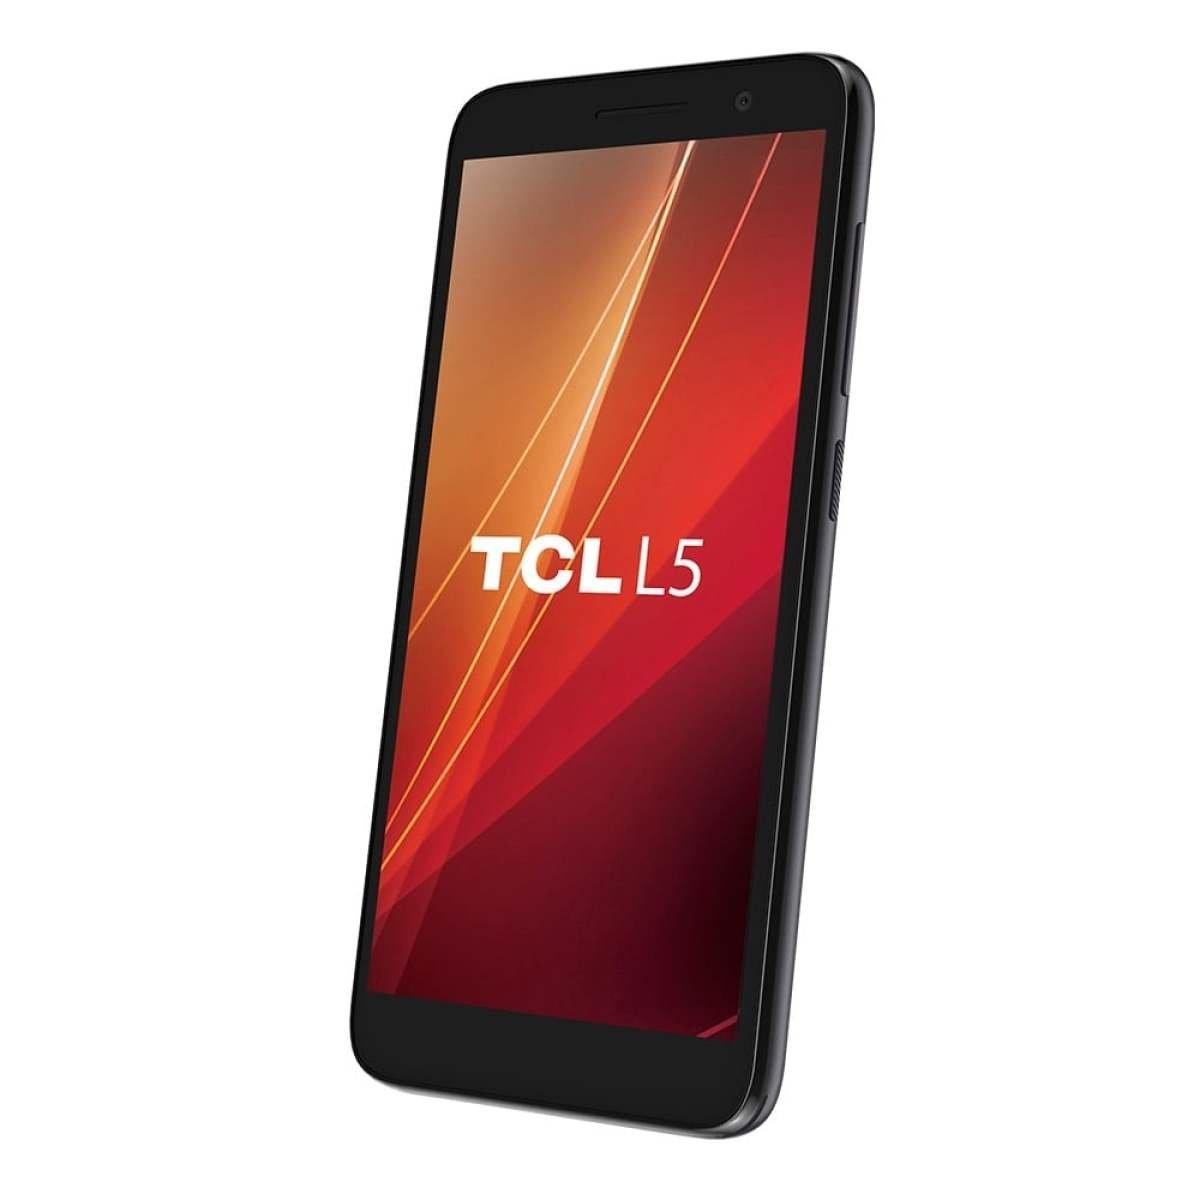 Smartphone L5 Preto Tela de 5 4G+Wi-Fi Android 8, Câm Tras de 8MP Frontal de 5MP 16GB 5033e - TCL